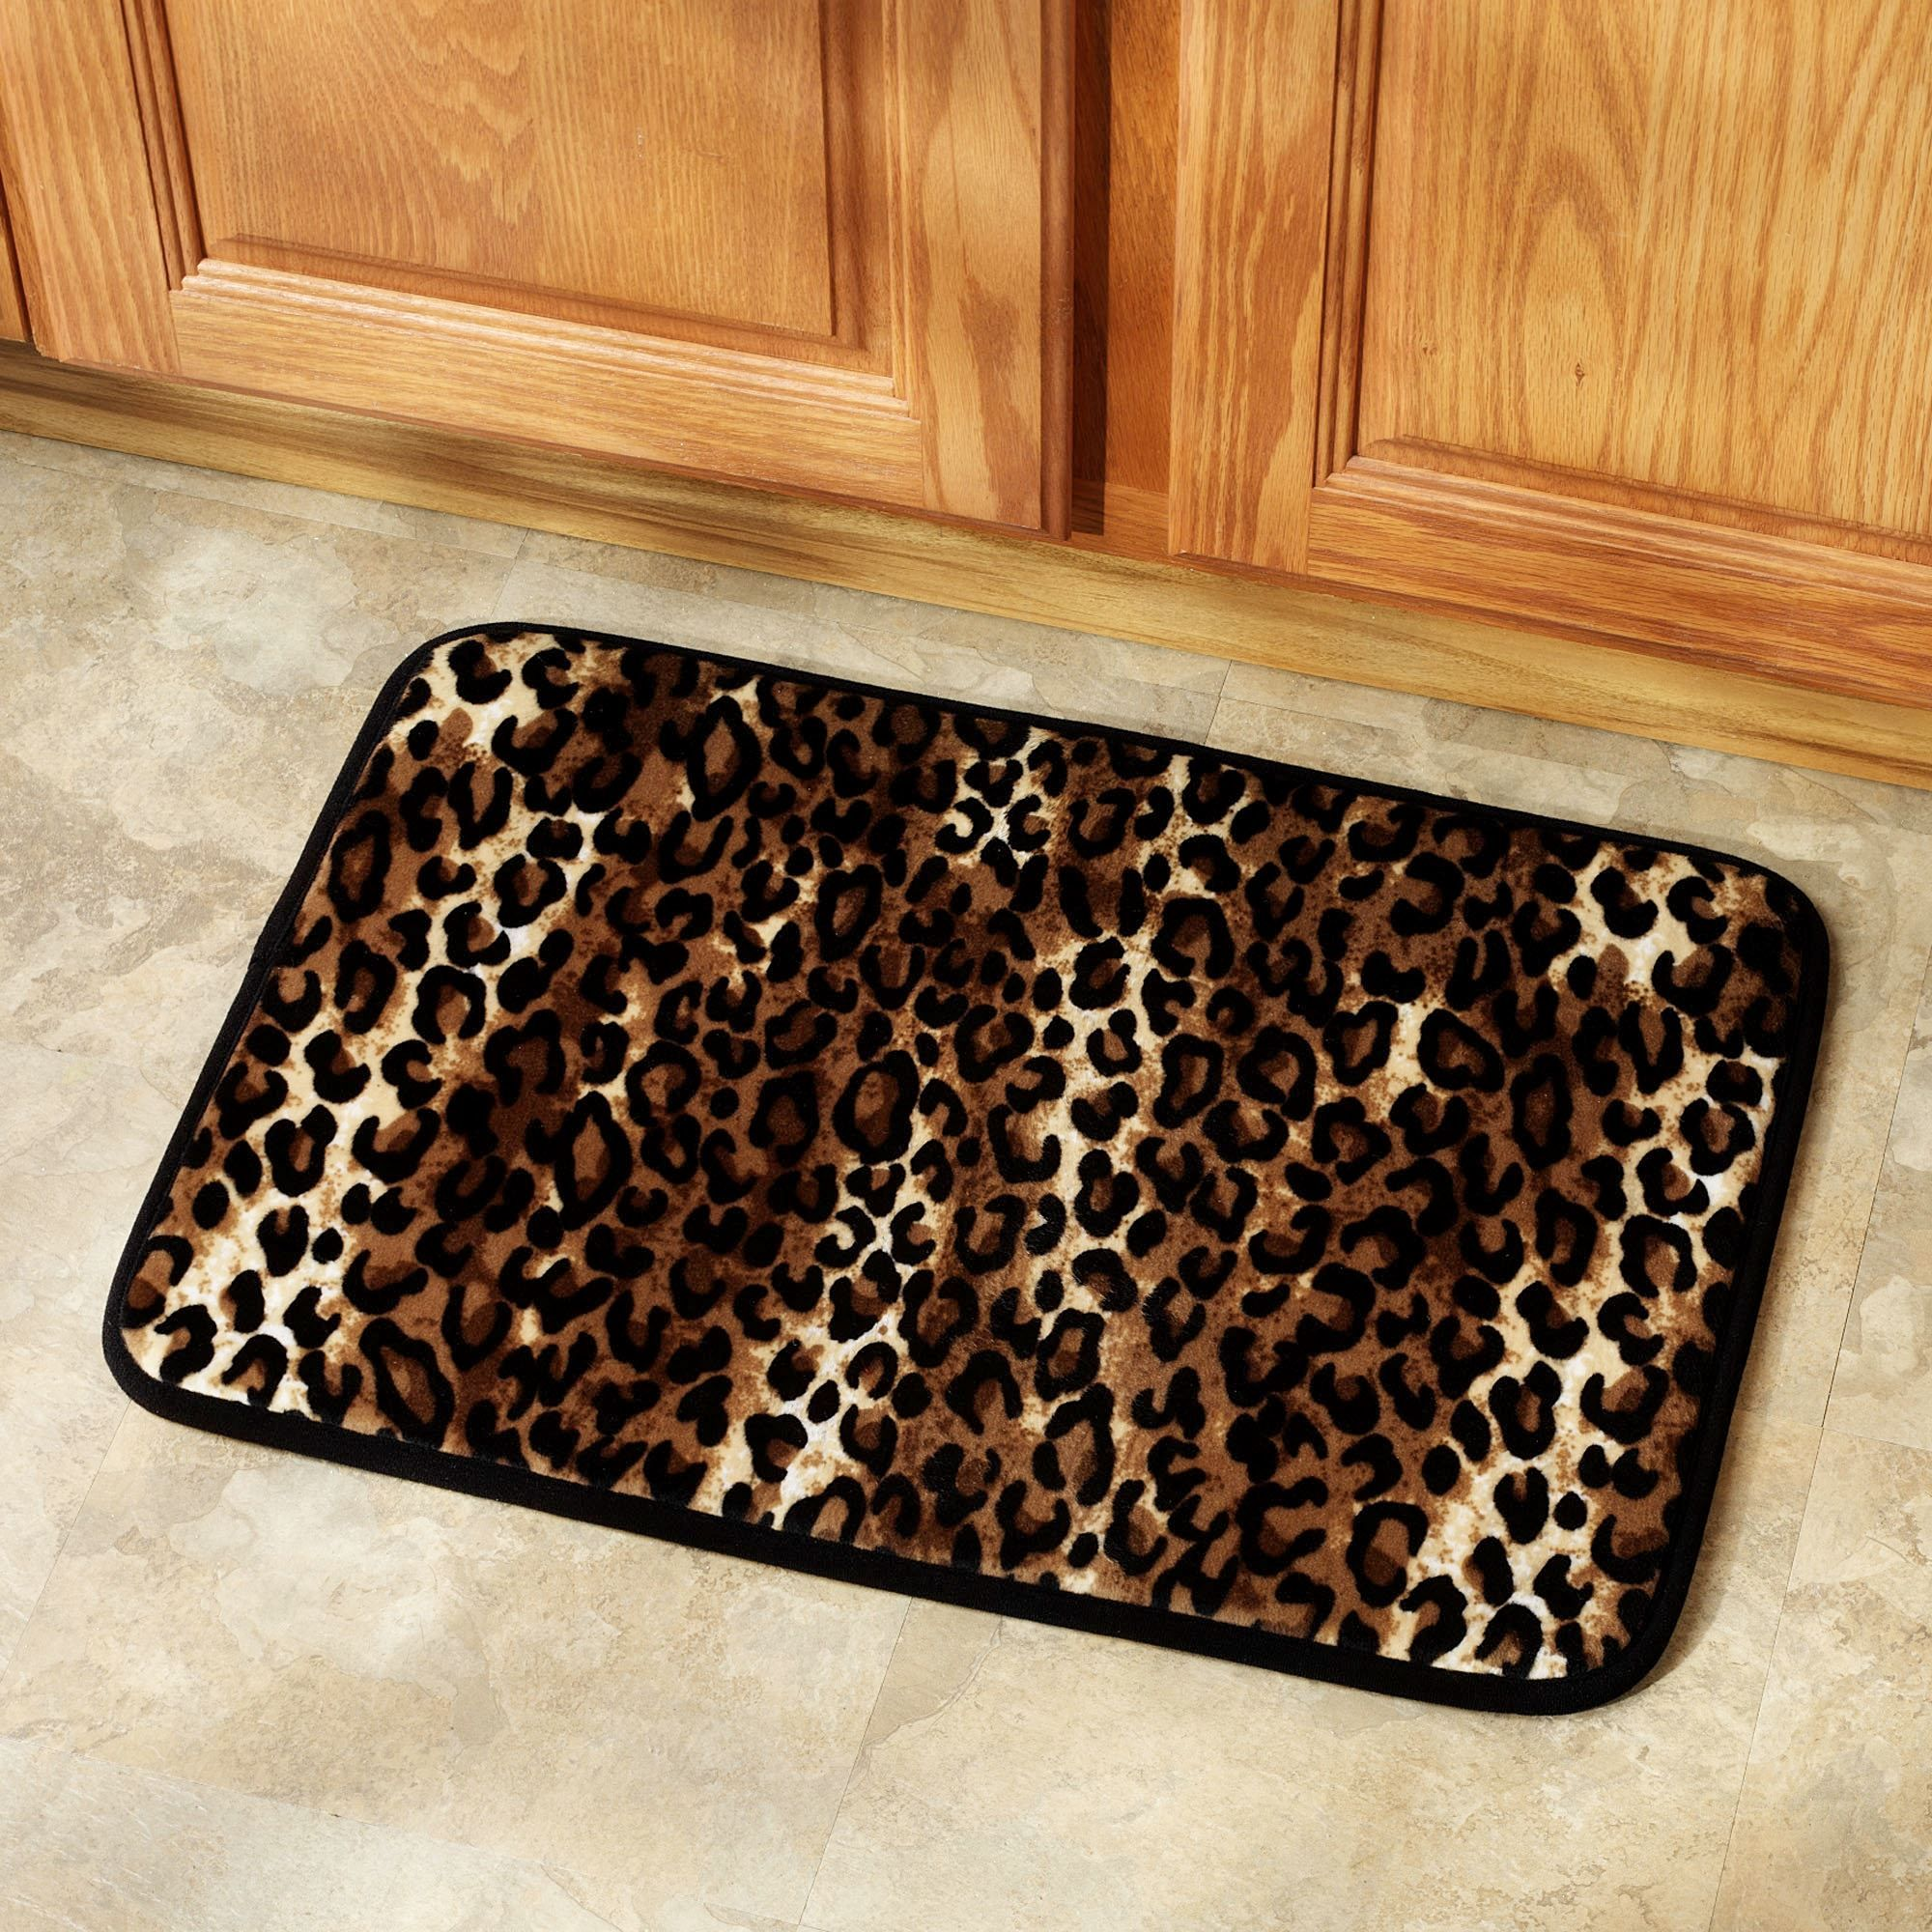 Leopard Print Bathroom